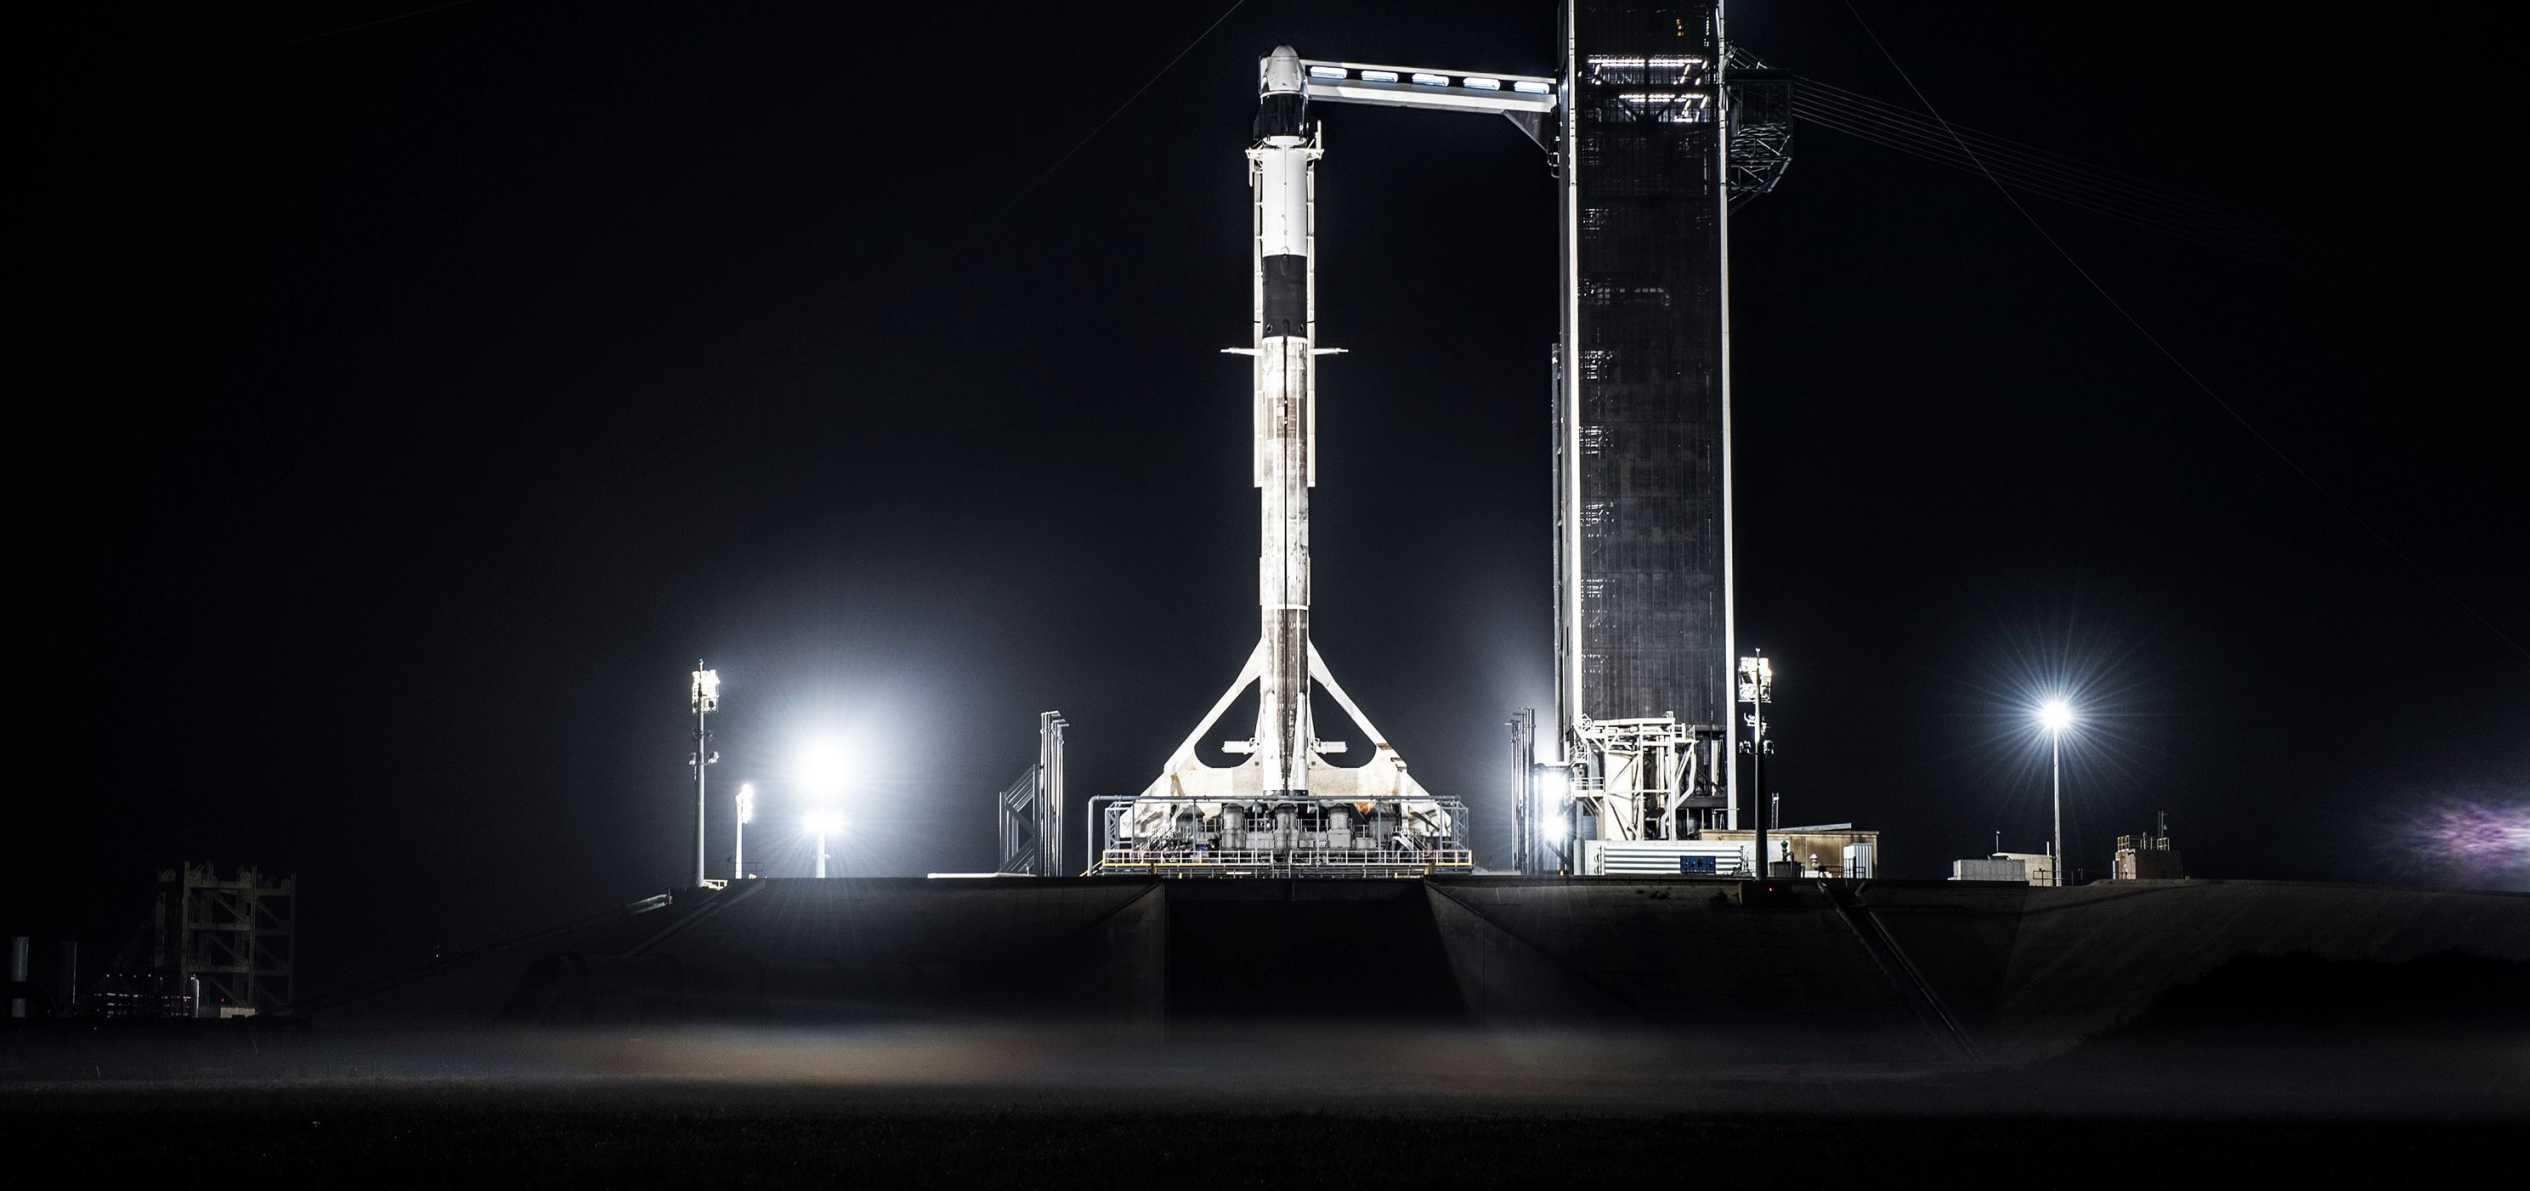 Crew Dragon C205 F9 B1046 IFA 39A vertical 011620 (SpaceX) 1 crop (c)